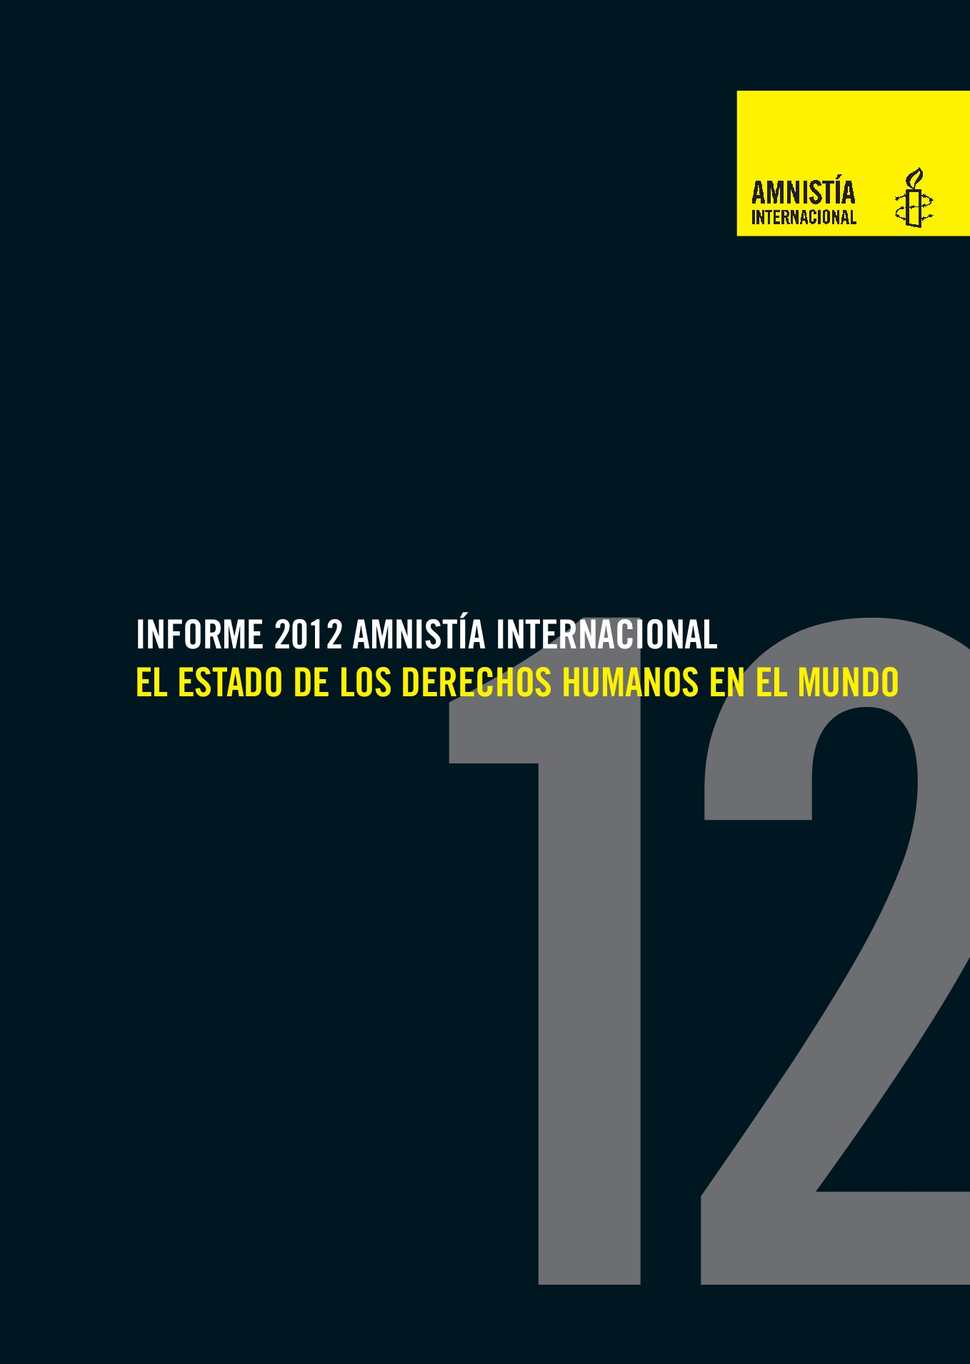 Calaméo - Informe 2012 de Amnistía Internacional